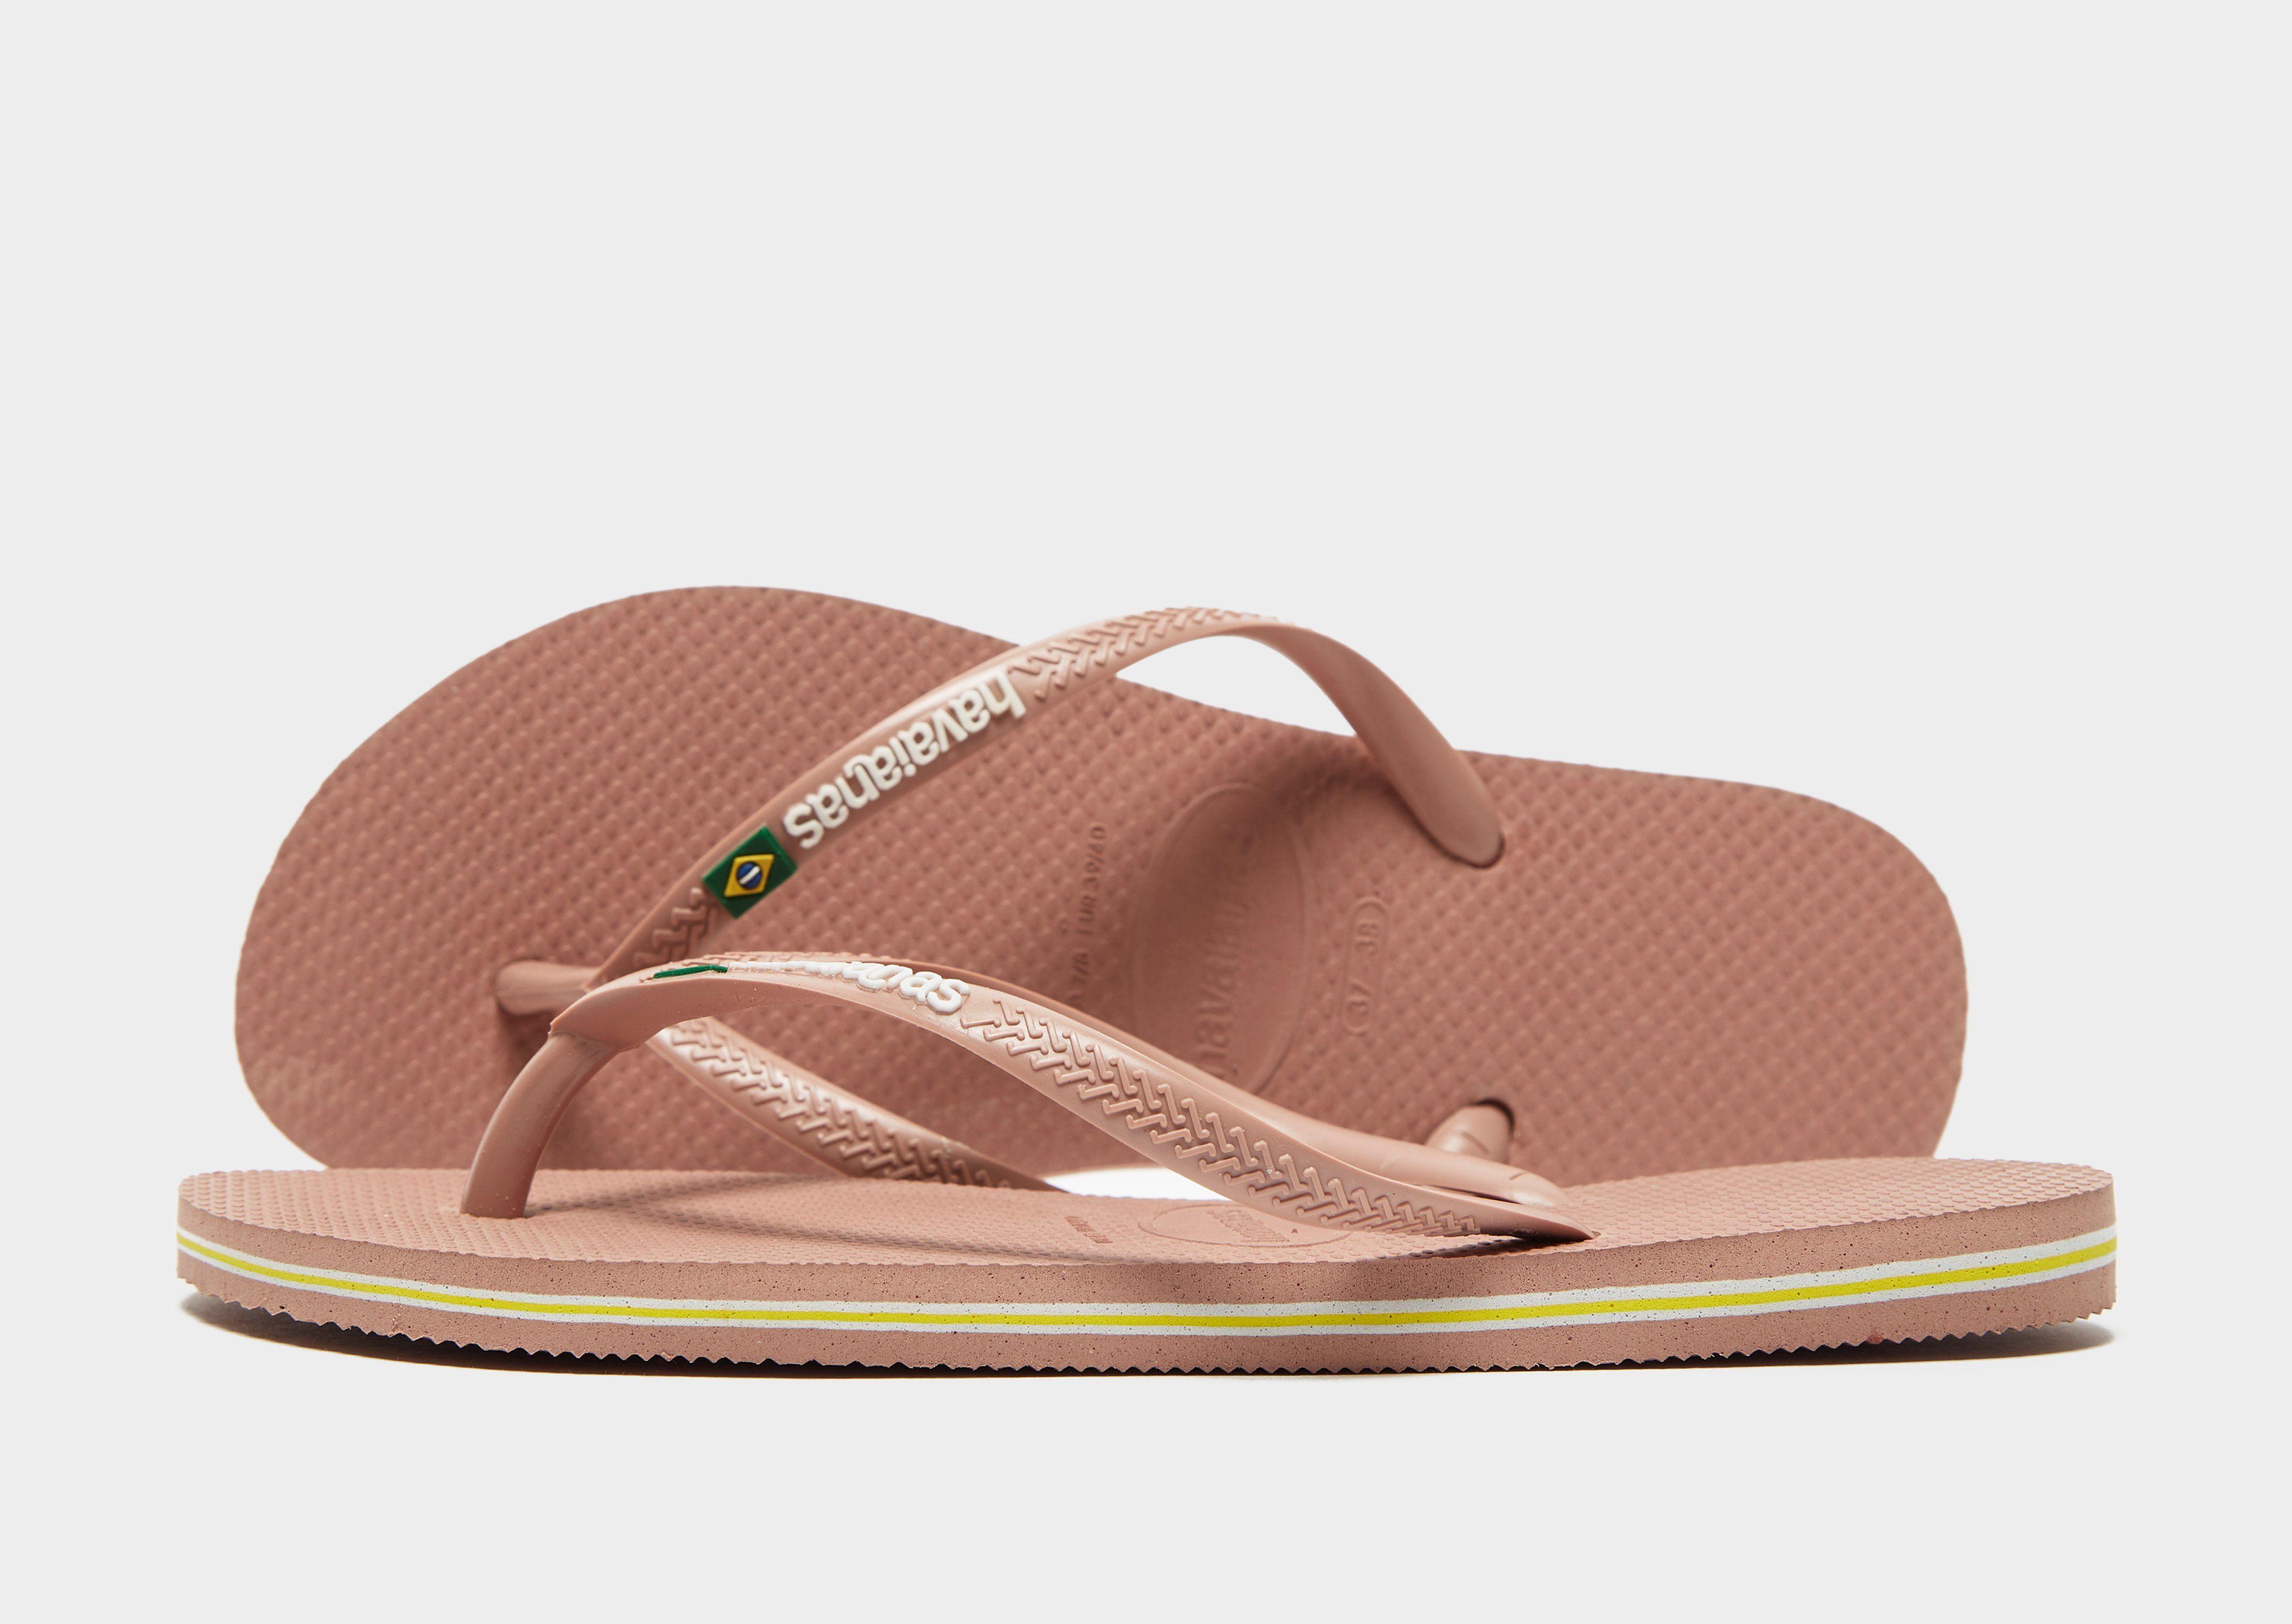 3cbf25180 Havaianas Slim Brasil Flip Flops Women s